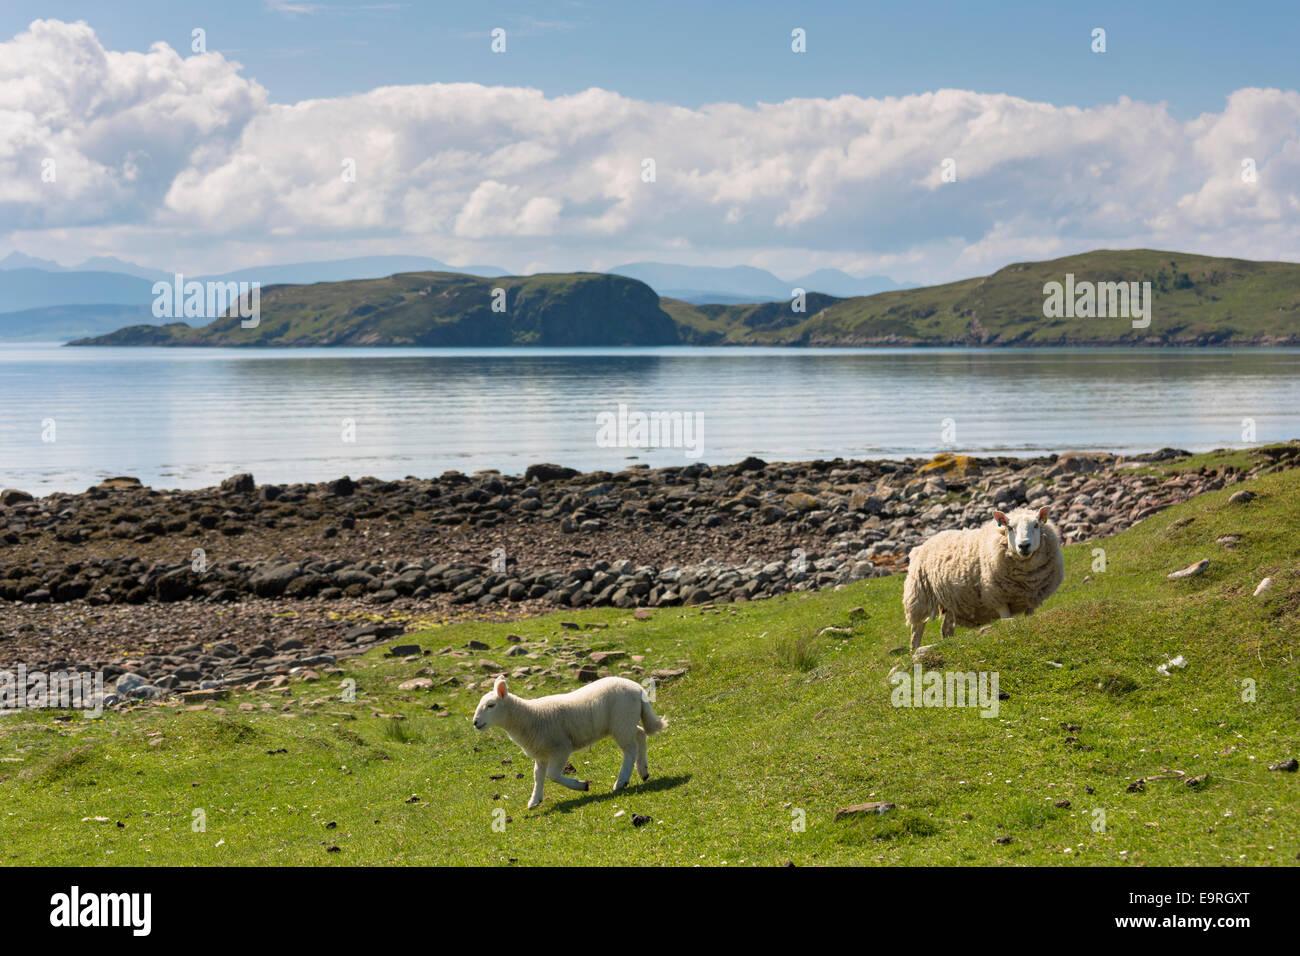 Sheep, ewe and lamb, at Achiltibuie on the West Coast of SCOTLAND - Stock Image